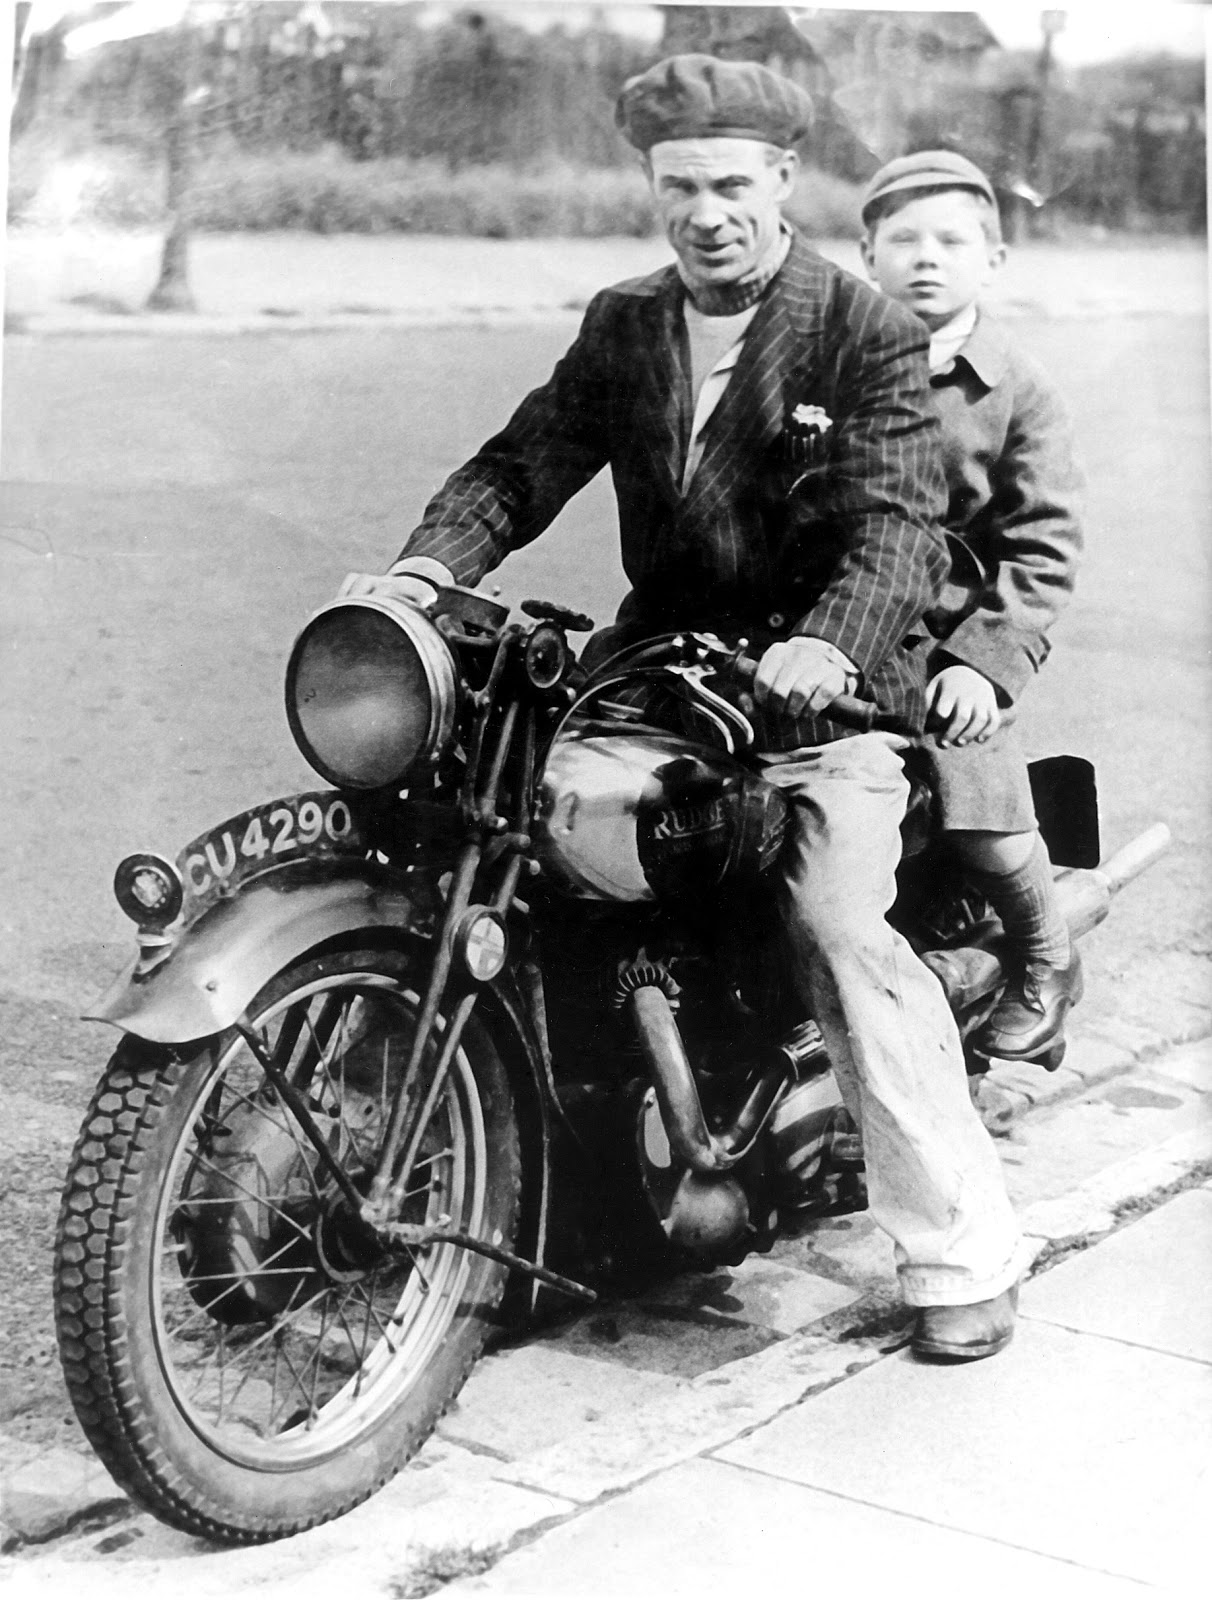 little boy on motorcycle - photo #25